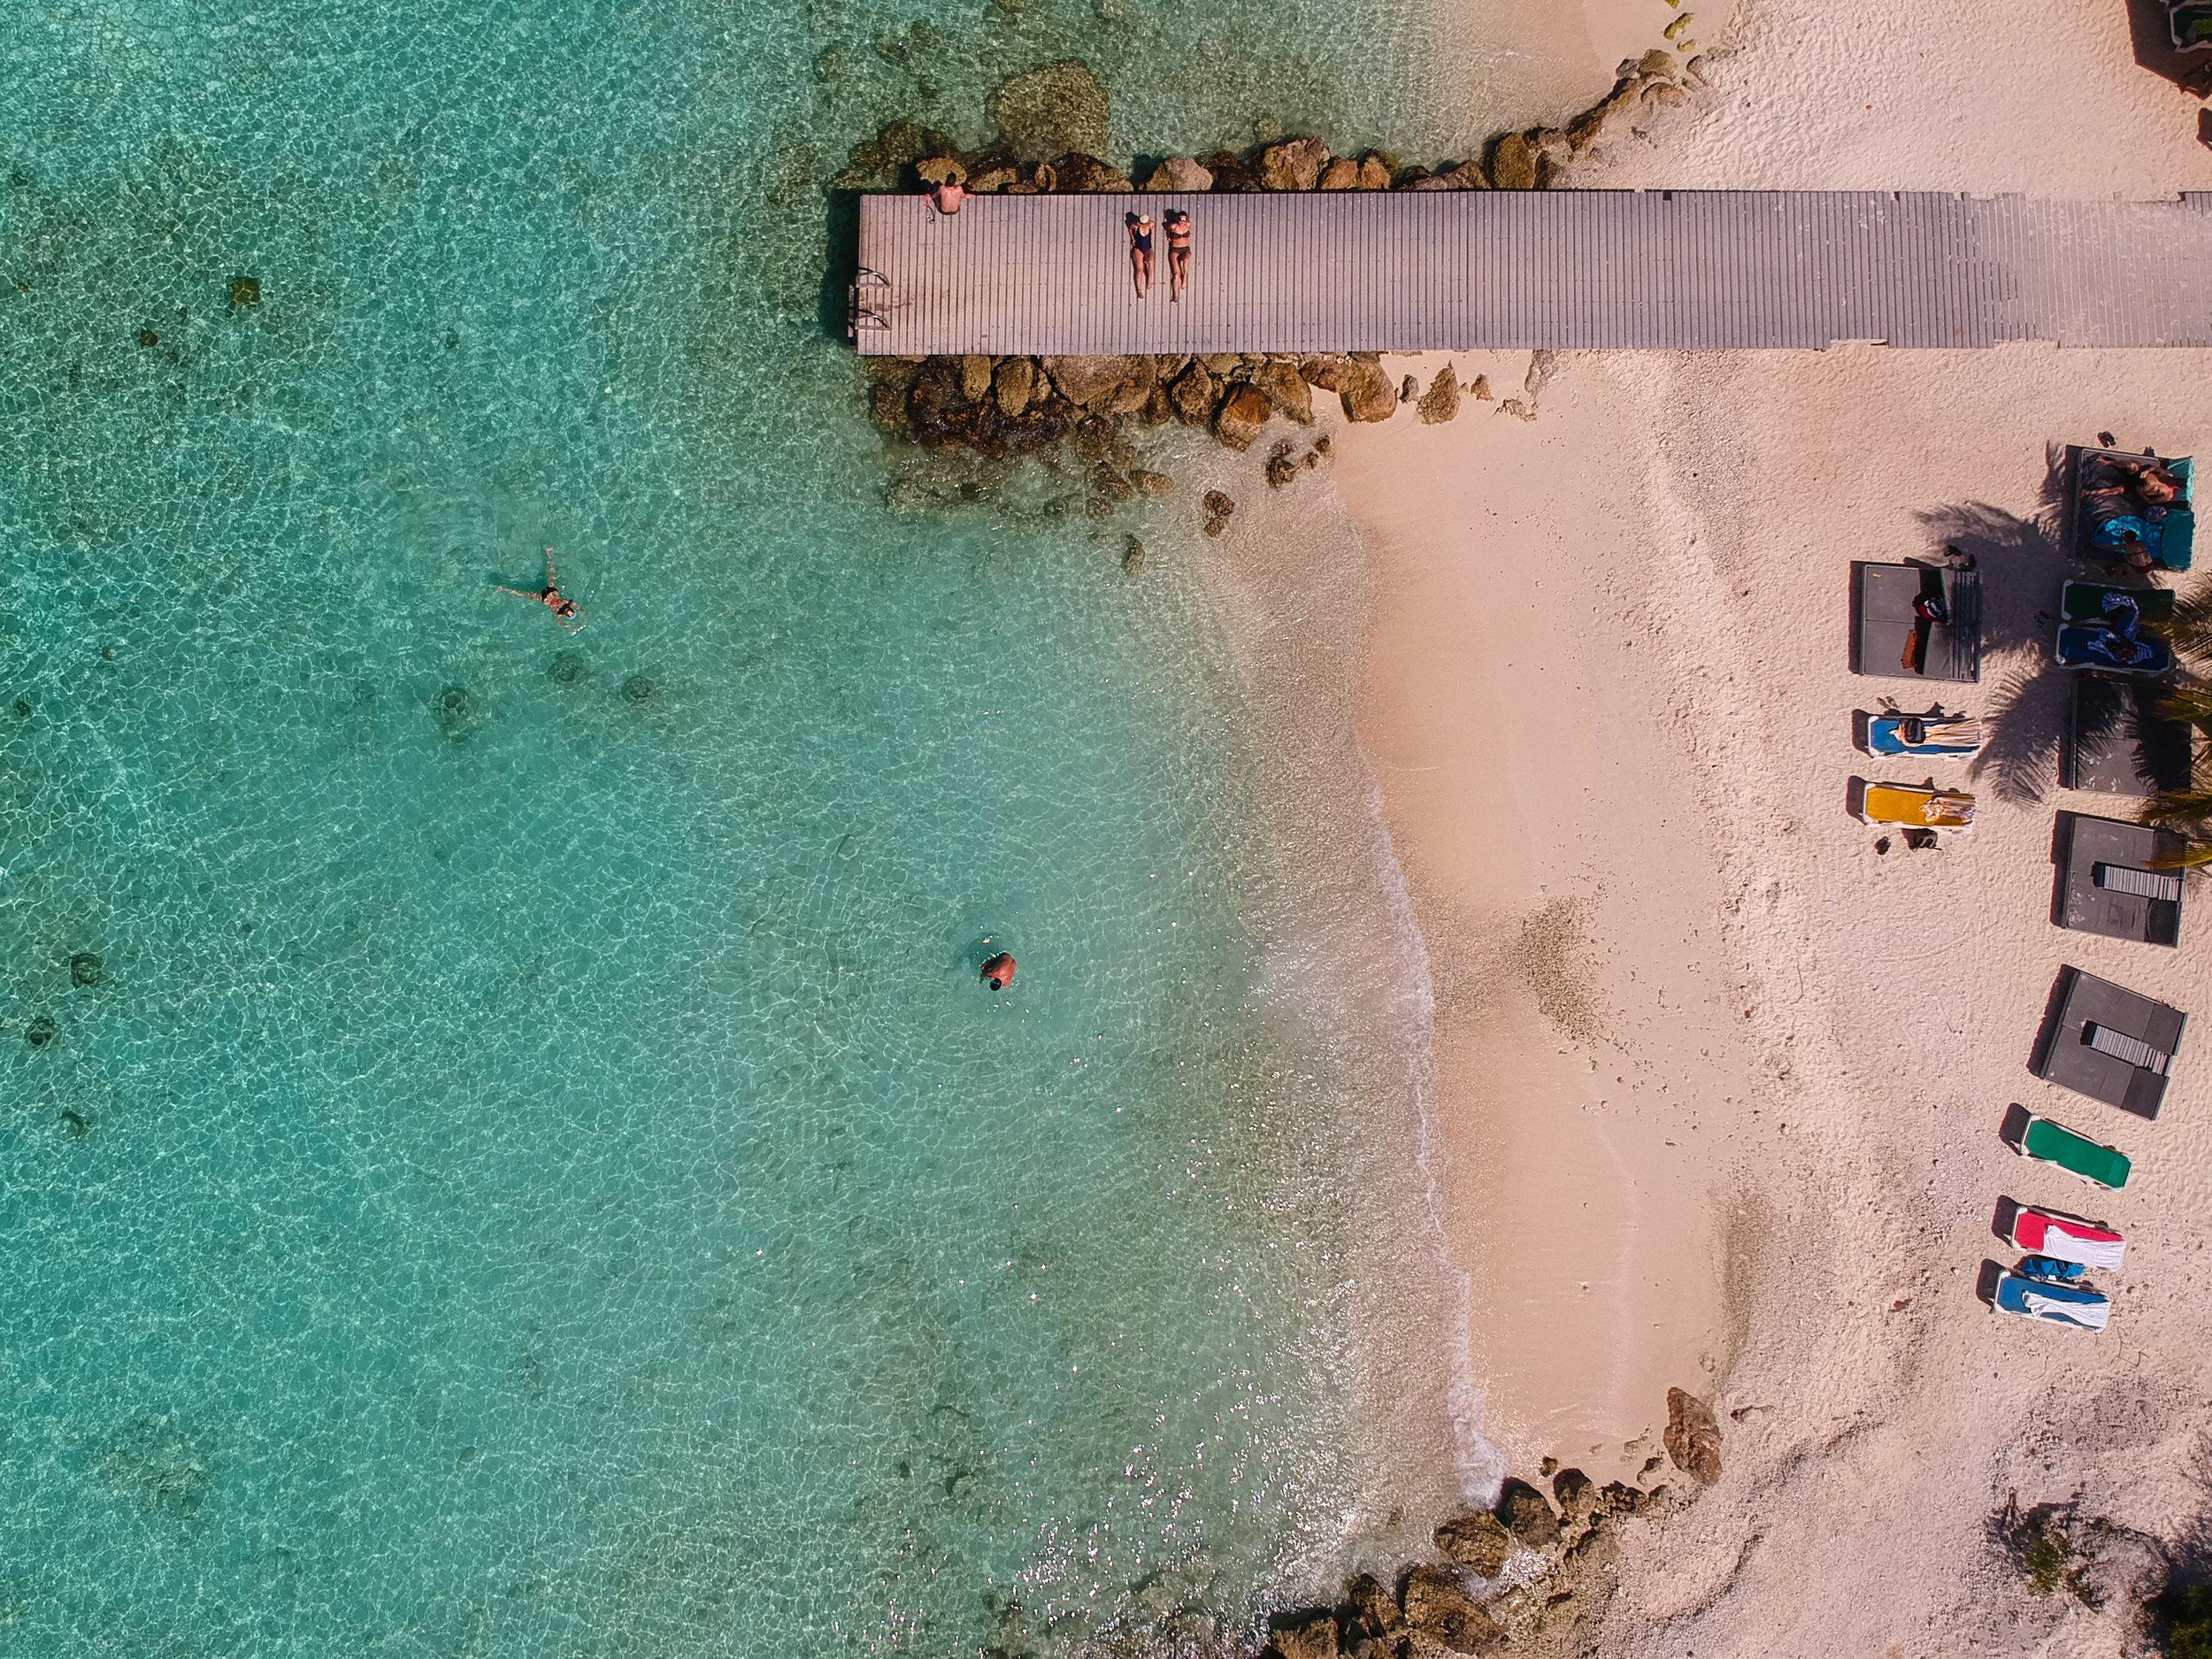 Caribbean Beach from Above